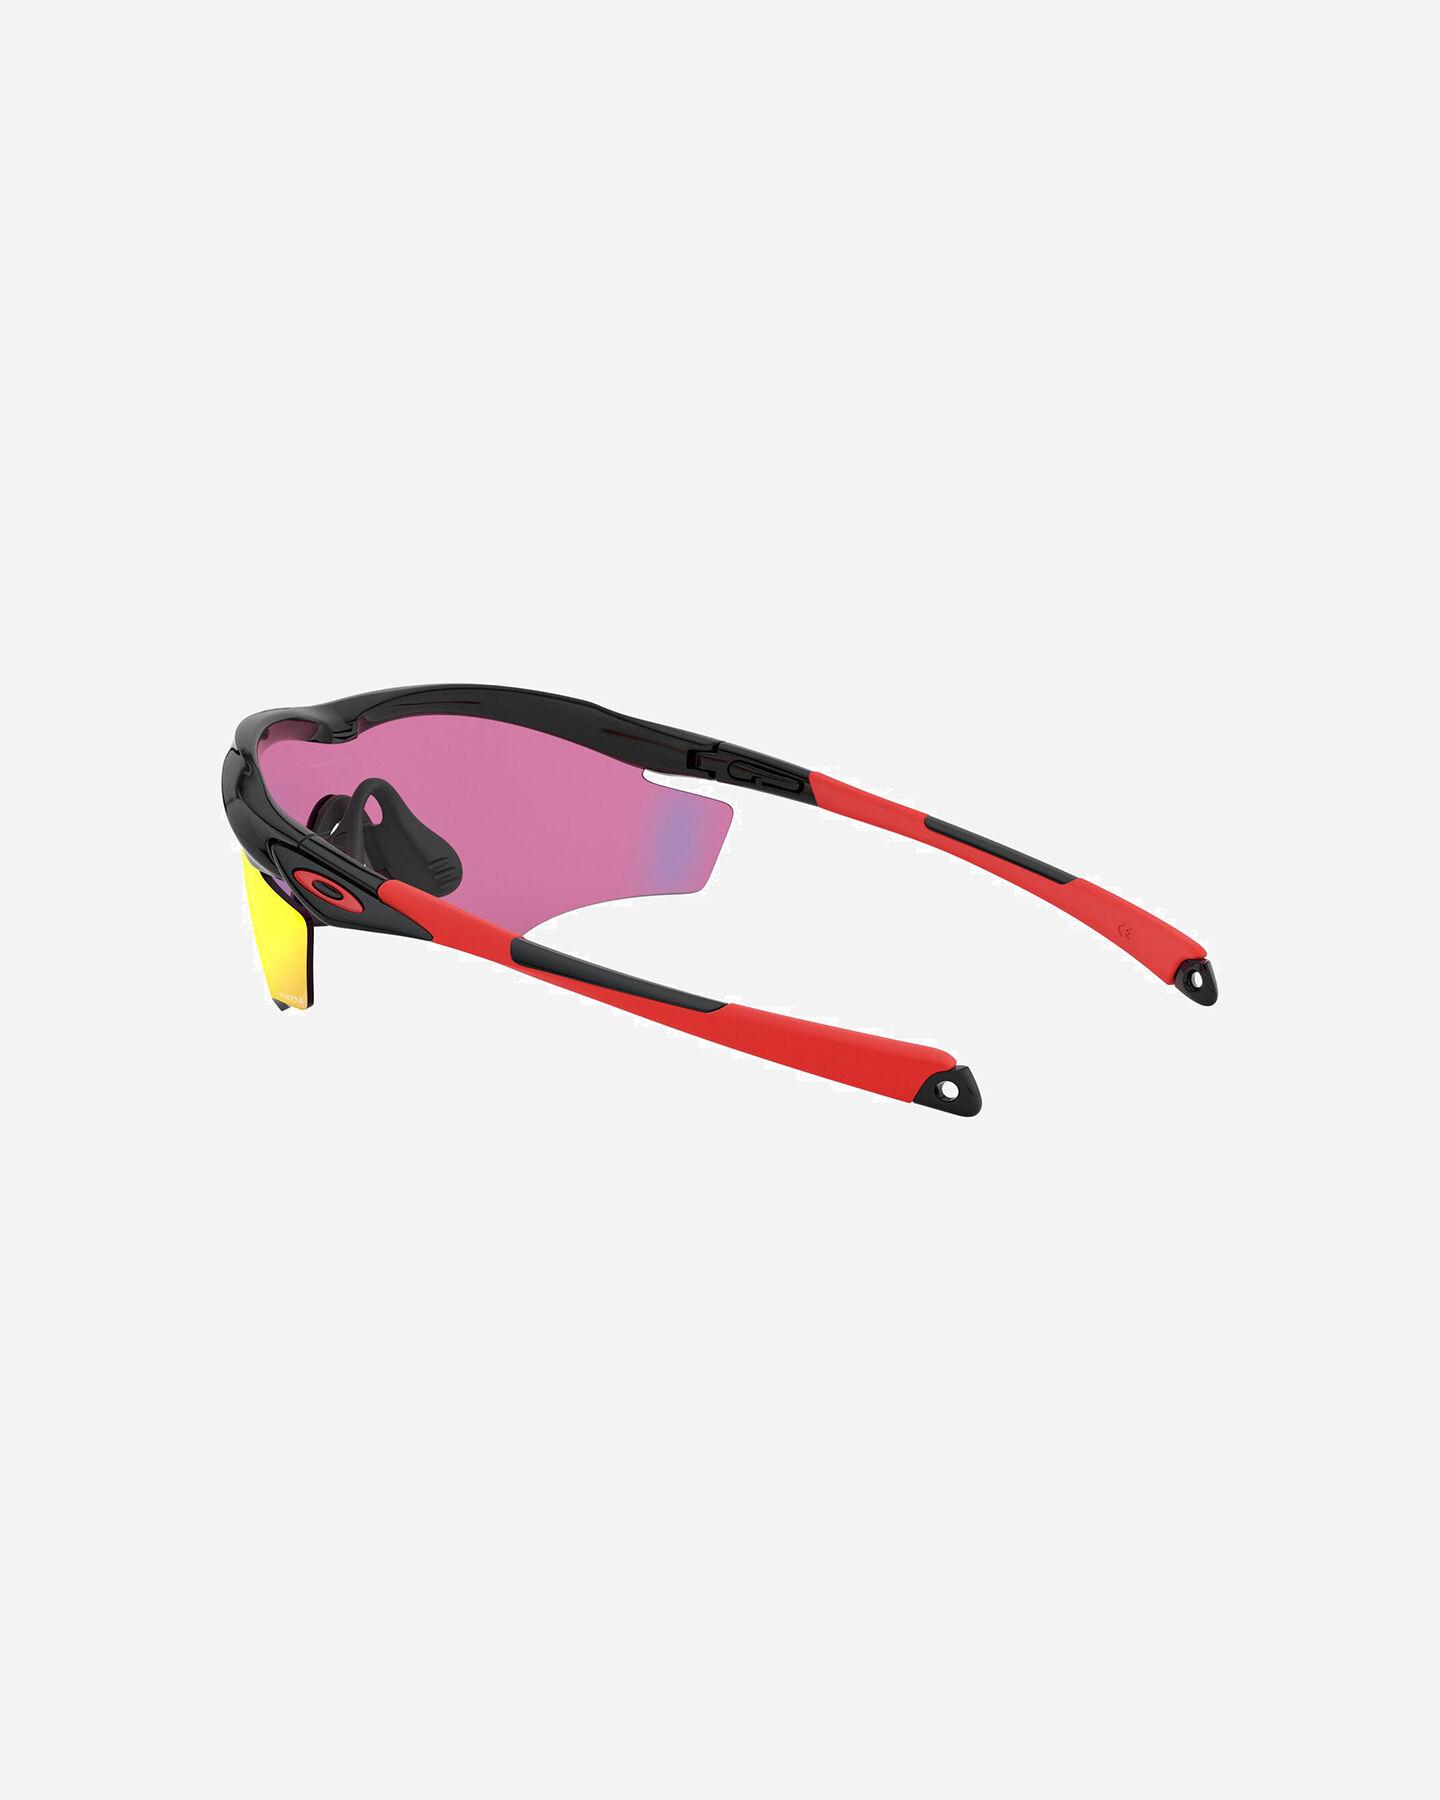 Occhiali OAKLEY M2 FRAME XL PRIZM S1313254|9999|UNI scatto 4